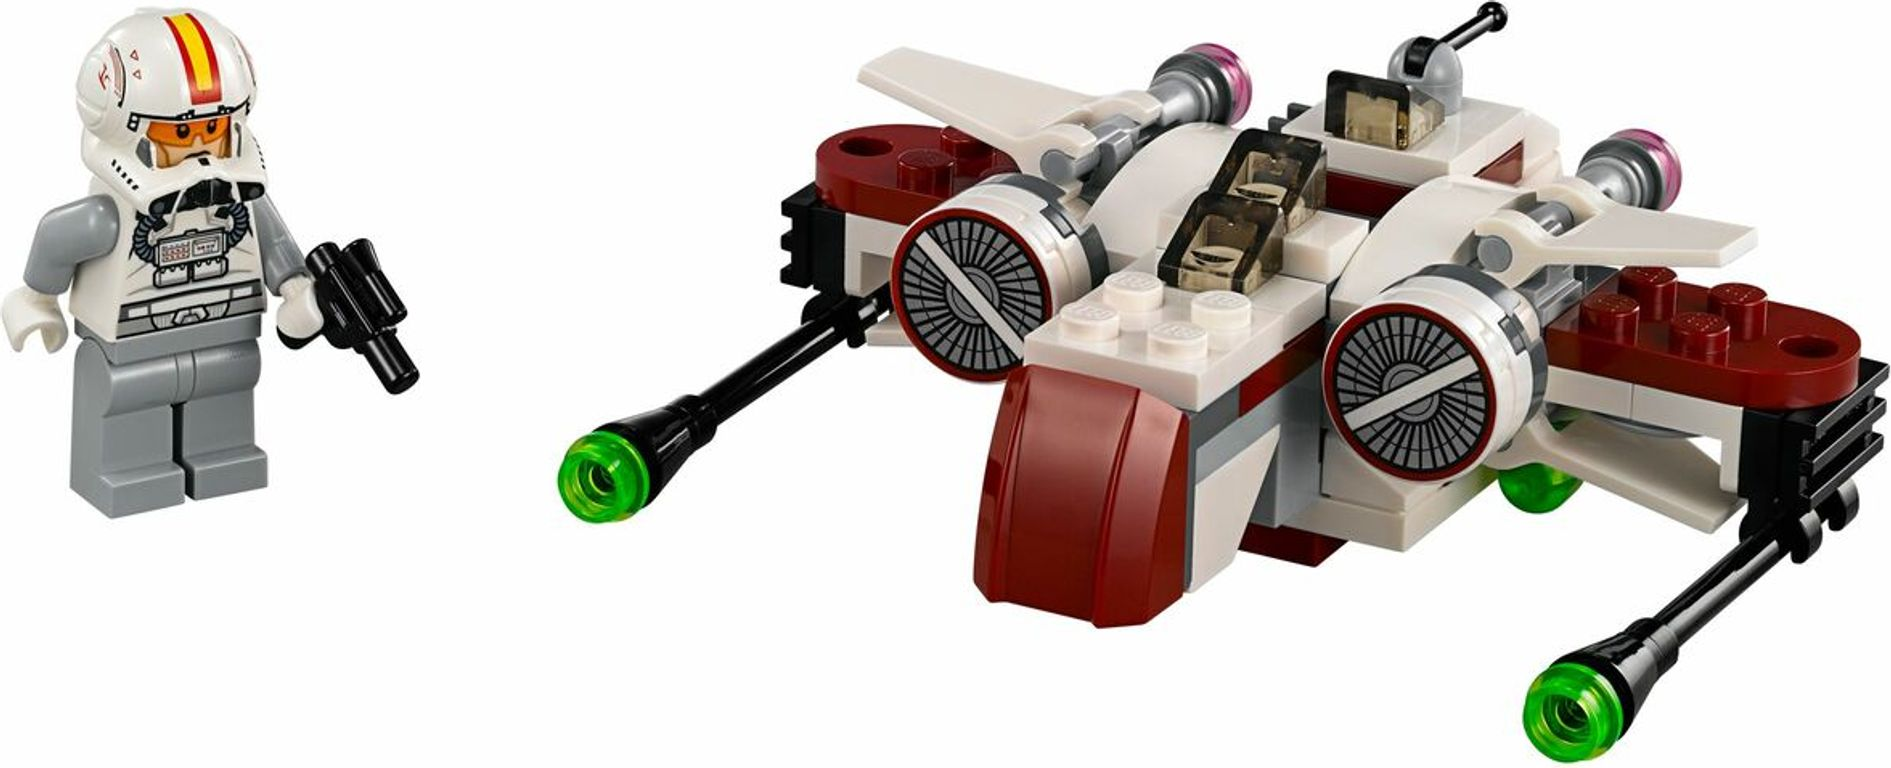 LEGO® Star Wars ARC-170 Starfighter components